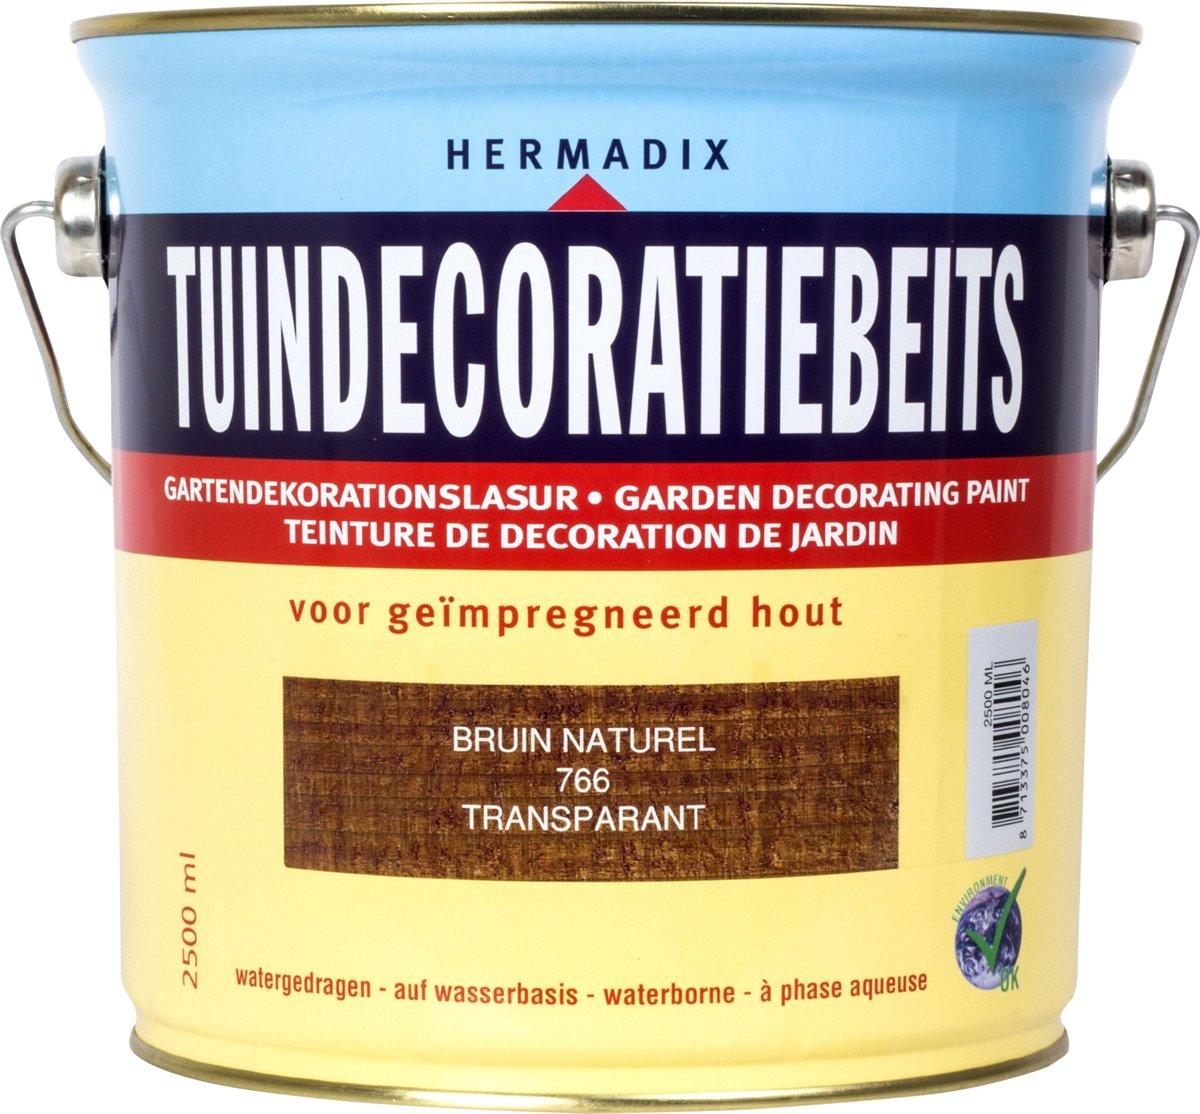 Hermadix Tuindecoratiebeits Transparant 766 Bruin Naturel - 2.5 l kopen